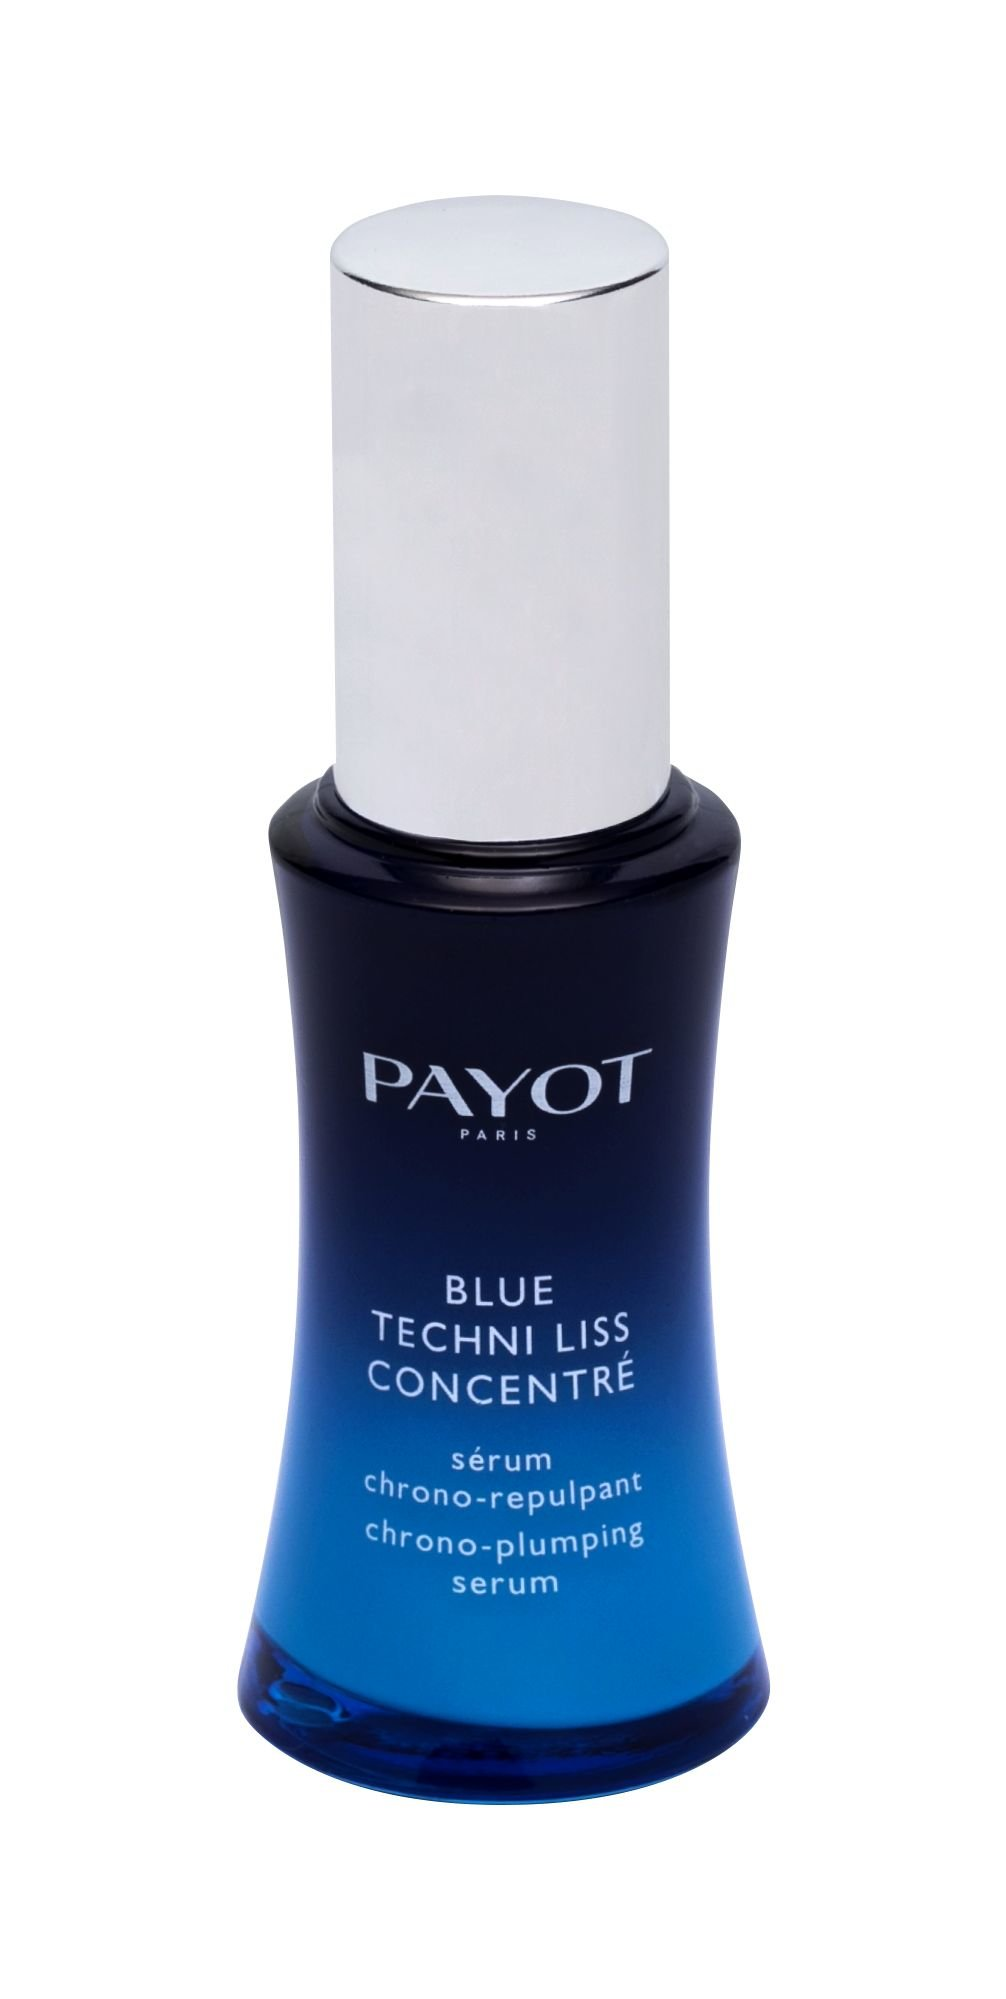 PAYOT Blue Techni Liss Skin Serum 30ml  Concentré